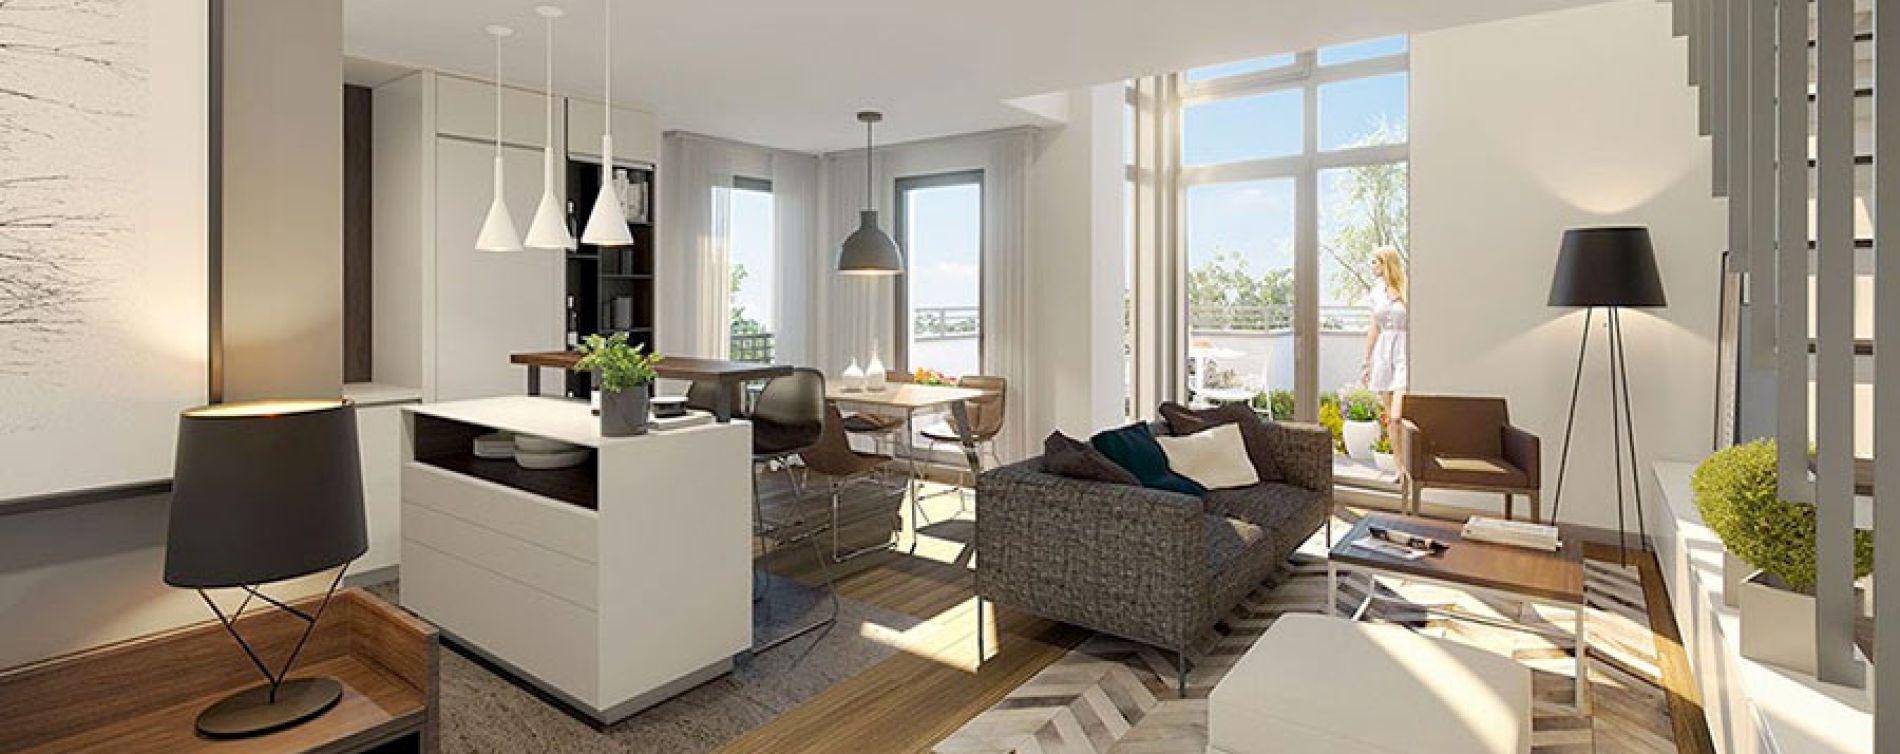 Saint-Maurice : programme immobilier neuve « Panoramiq' » (5)